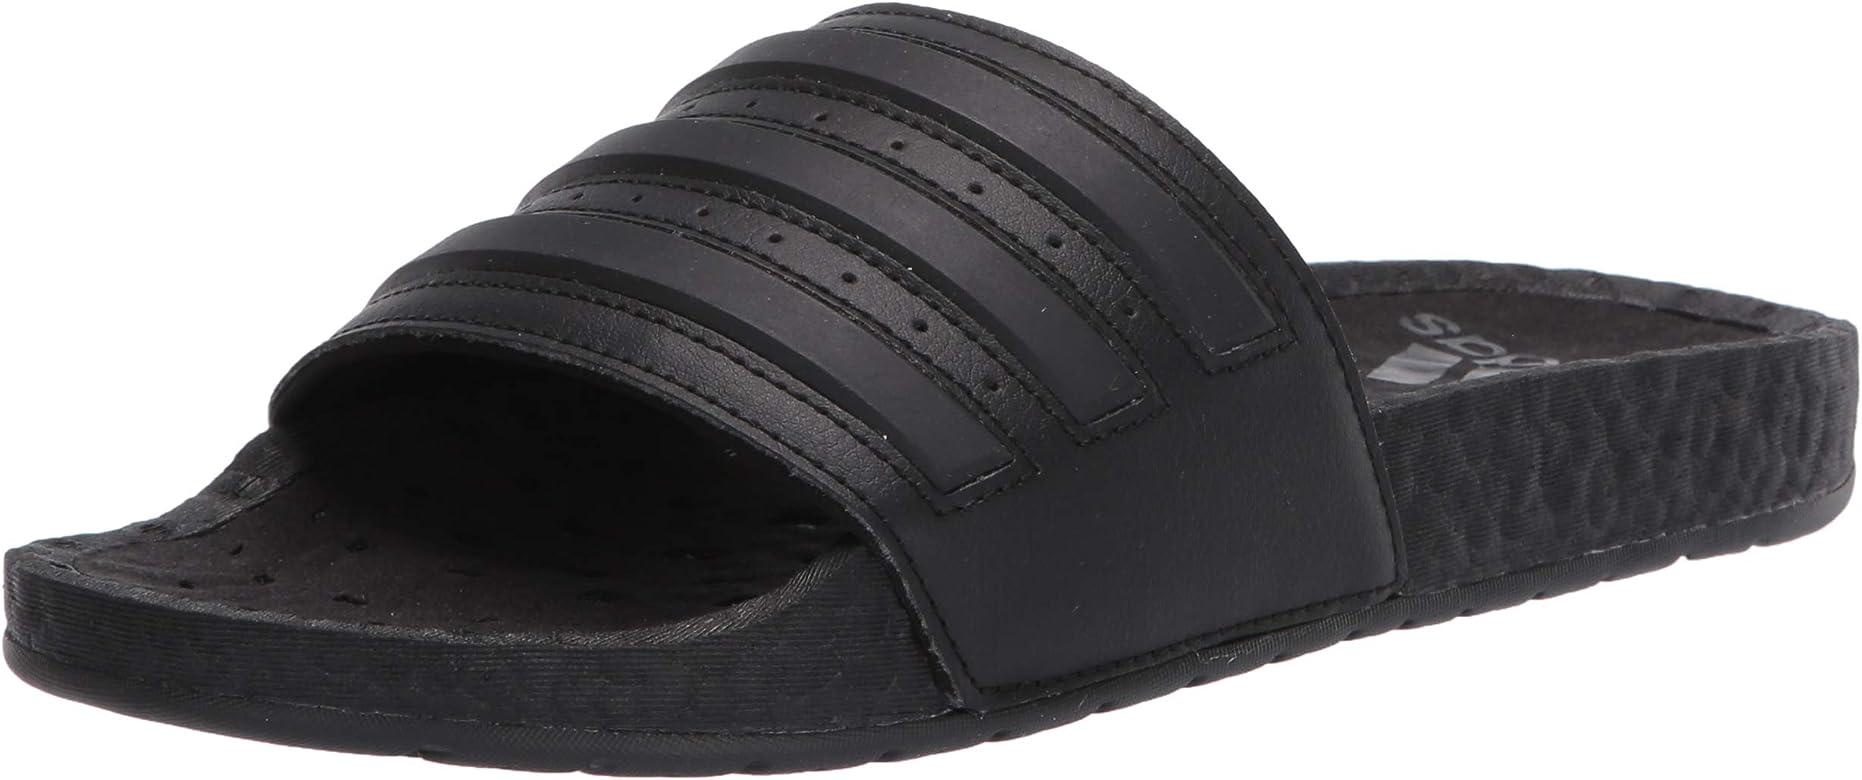 adidas sandals price list